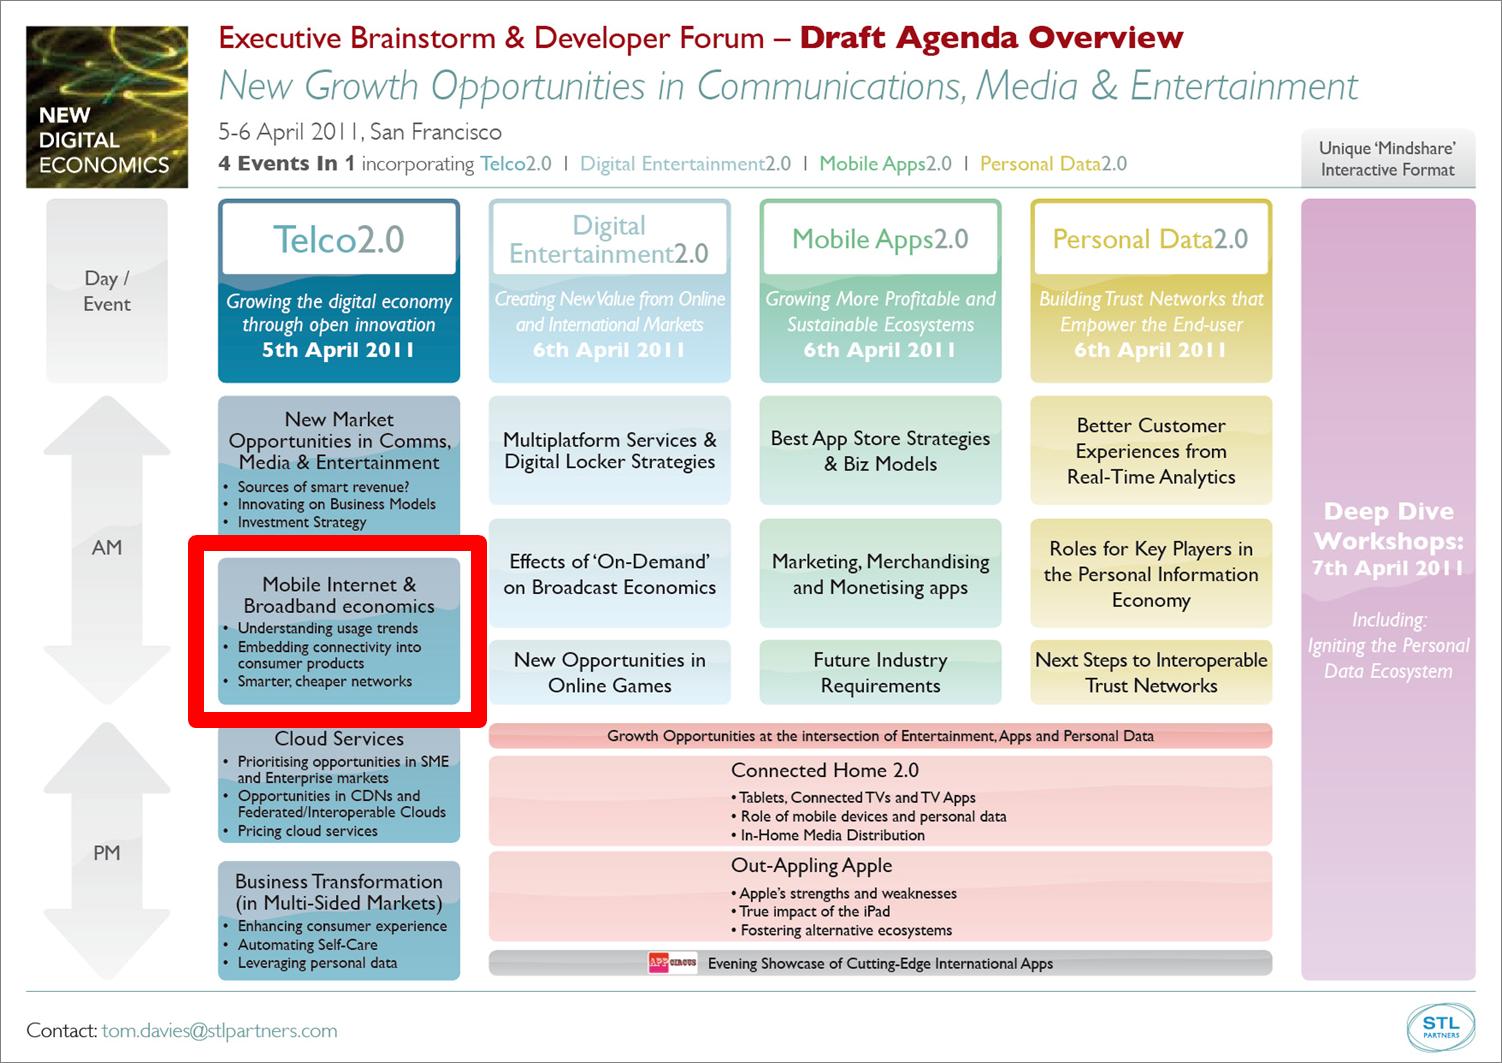 Convention Agenda Template Google Search Layout Ideas Pinterest - Google agenda template